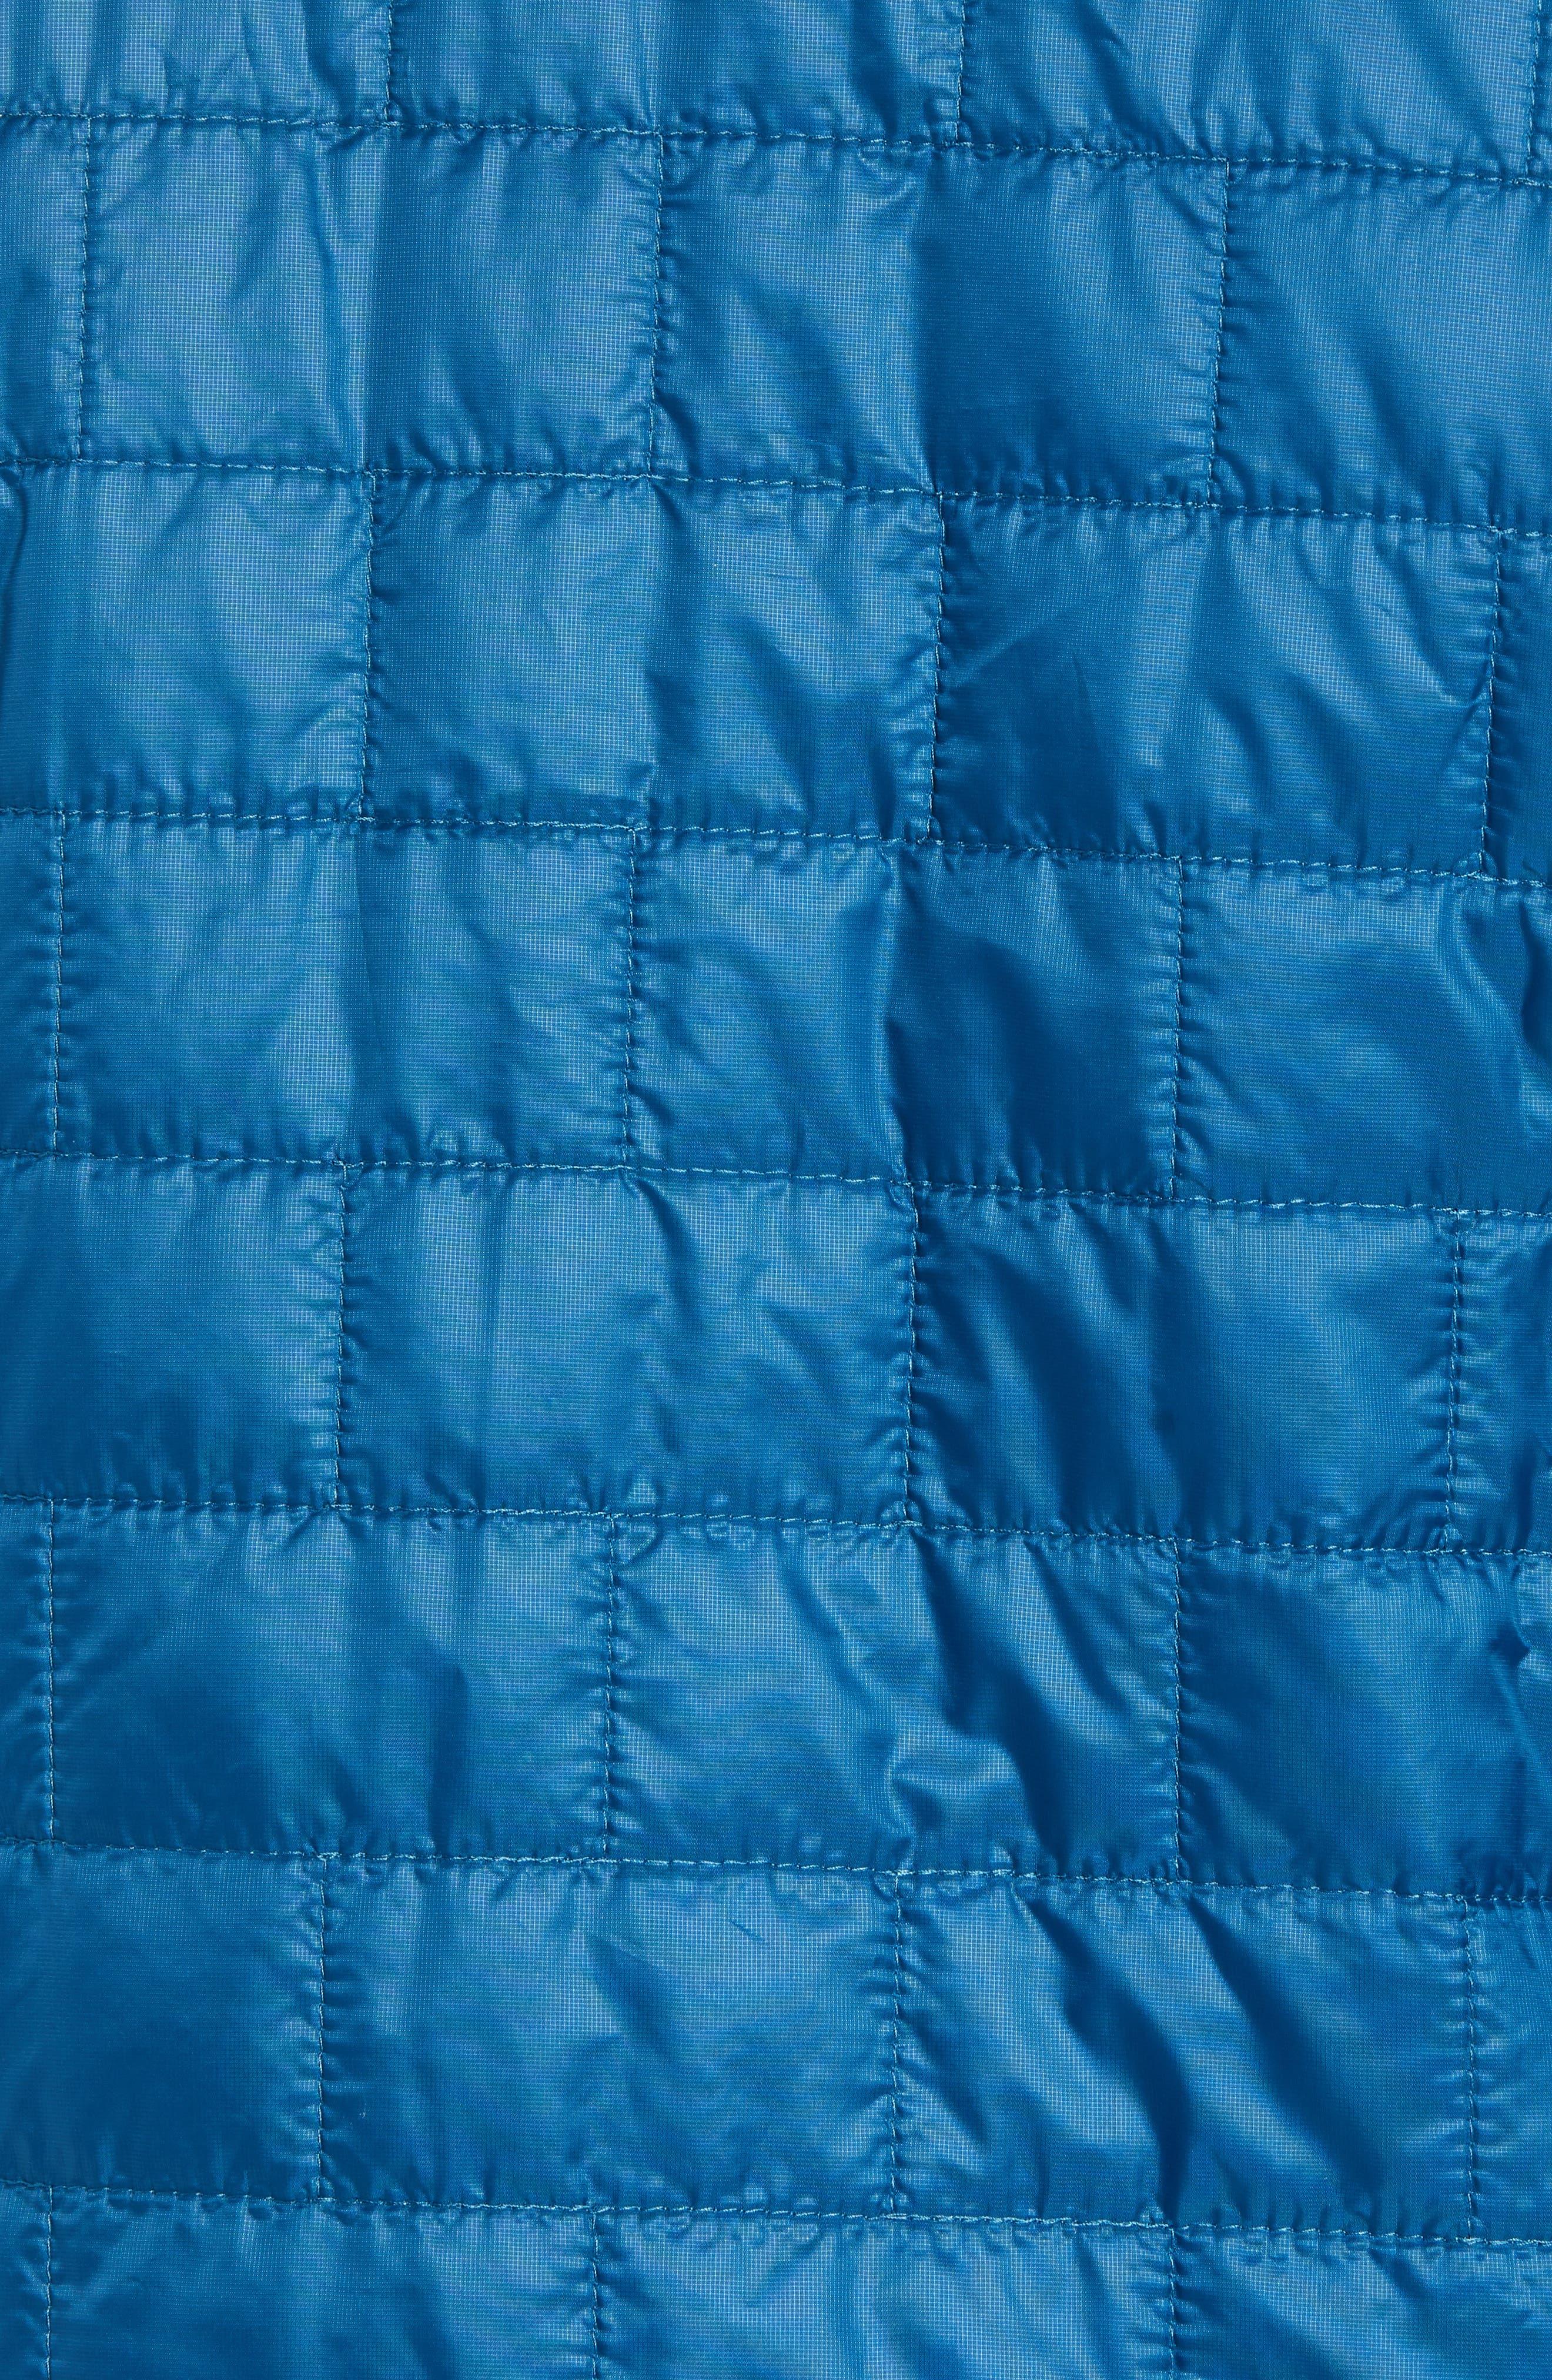 PATAGONIA, 'Nano Puff<sup>®</sup>' Water Resistant Jacket, Alternate thumbnail 7, color, BIG SUR BLUE W/ BALKAN BLUE